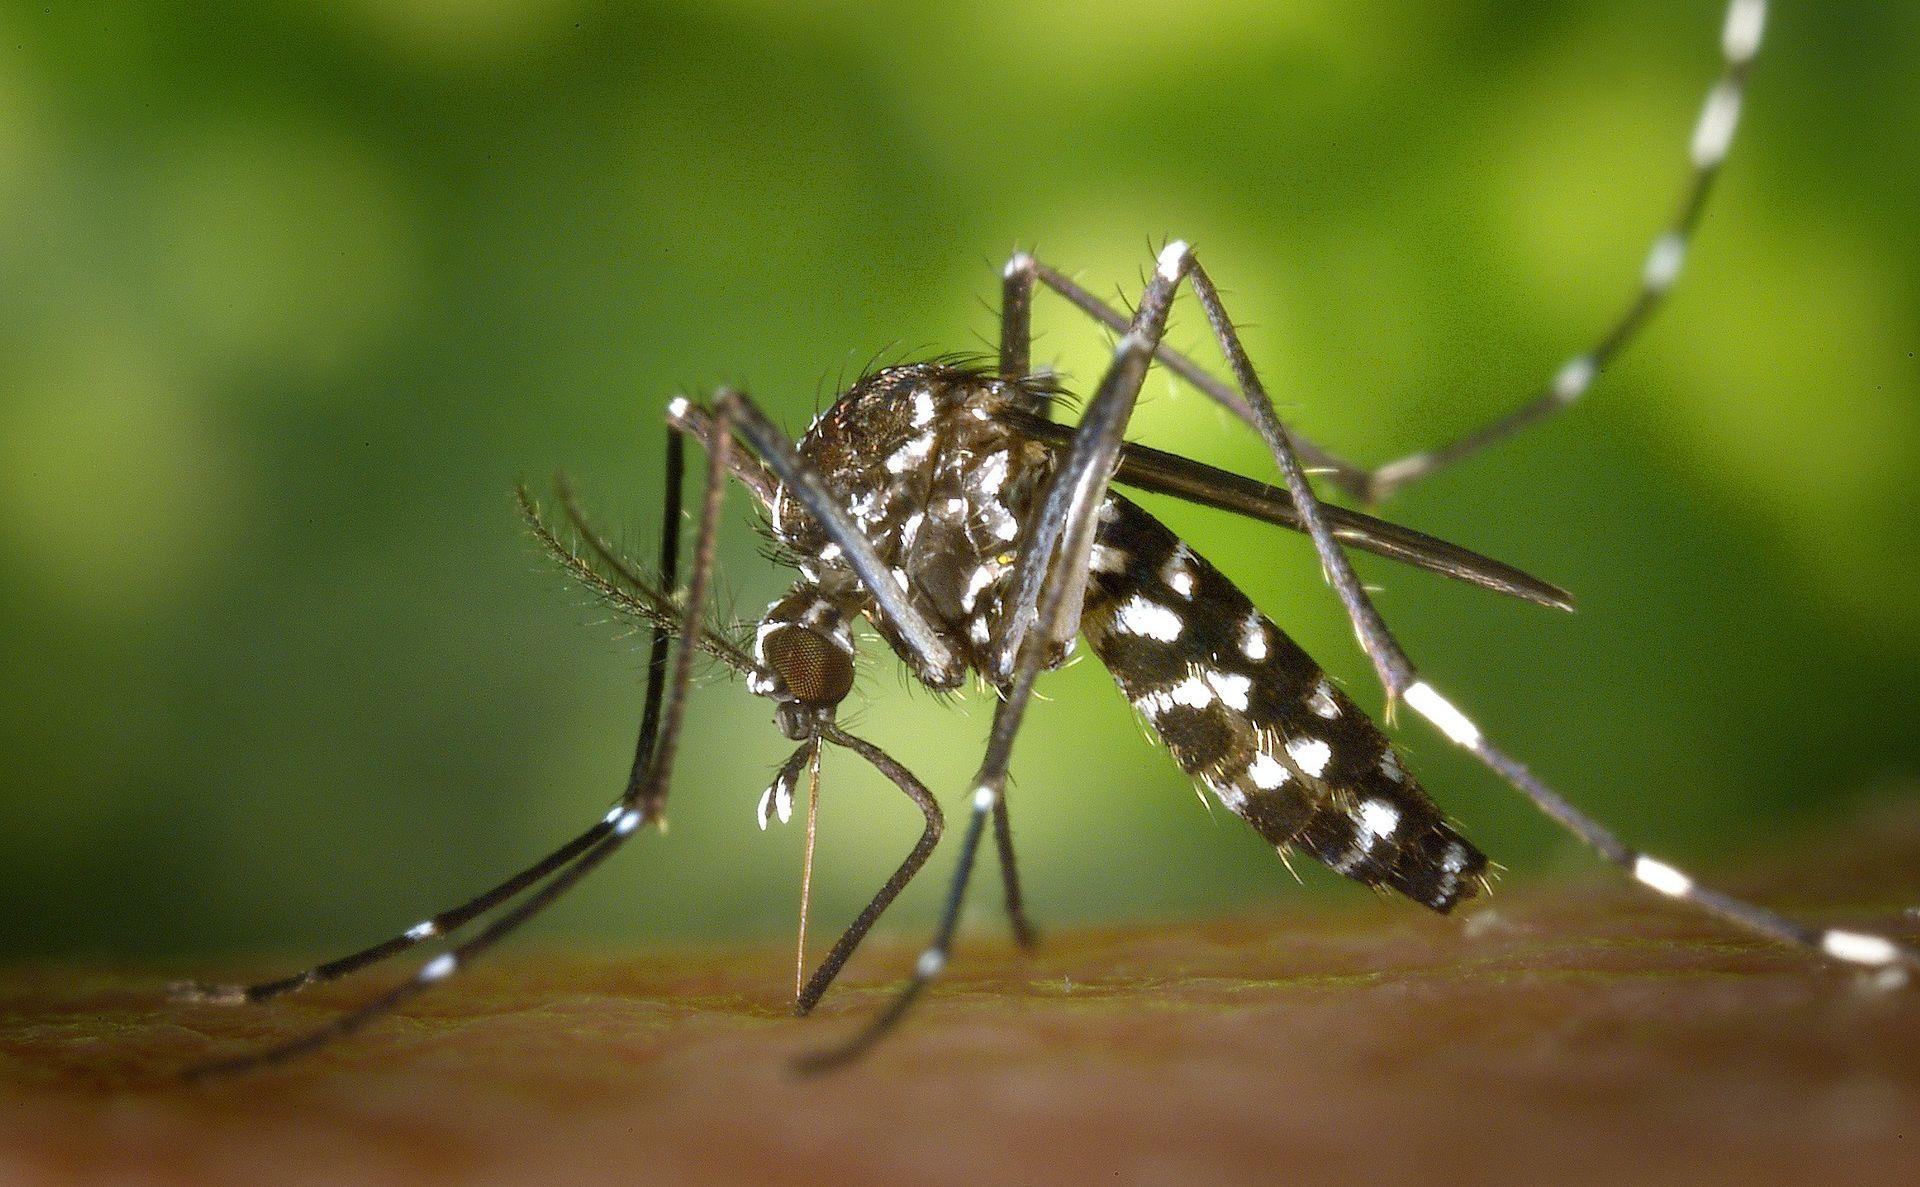 OPASNA BOLEST Epidemija virusom zika počela na Martiniqueu i u Gvajani